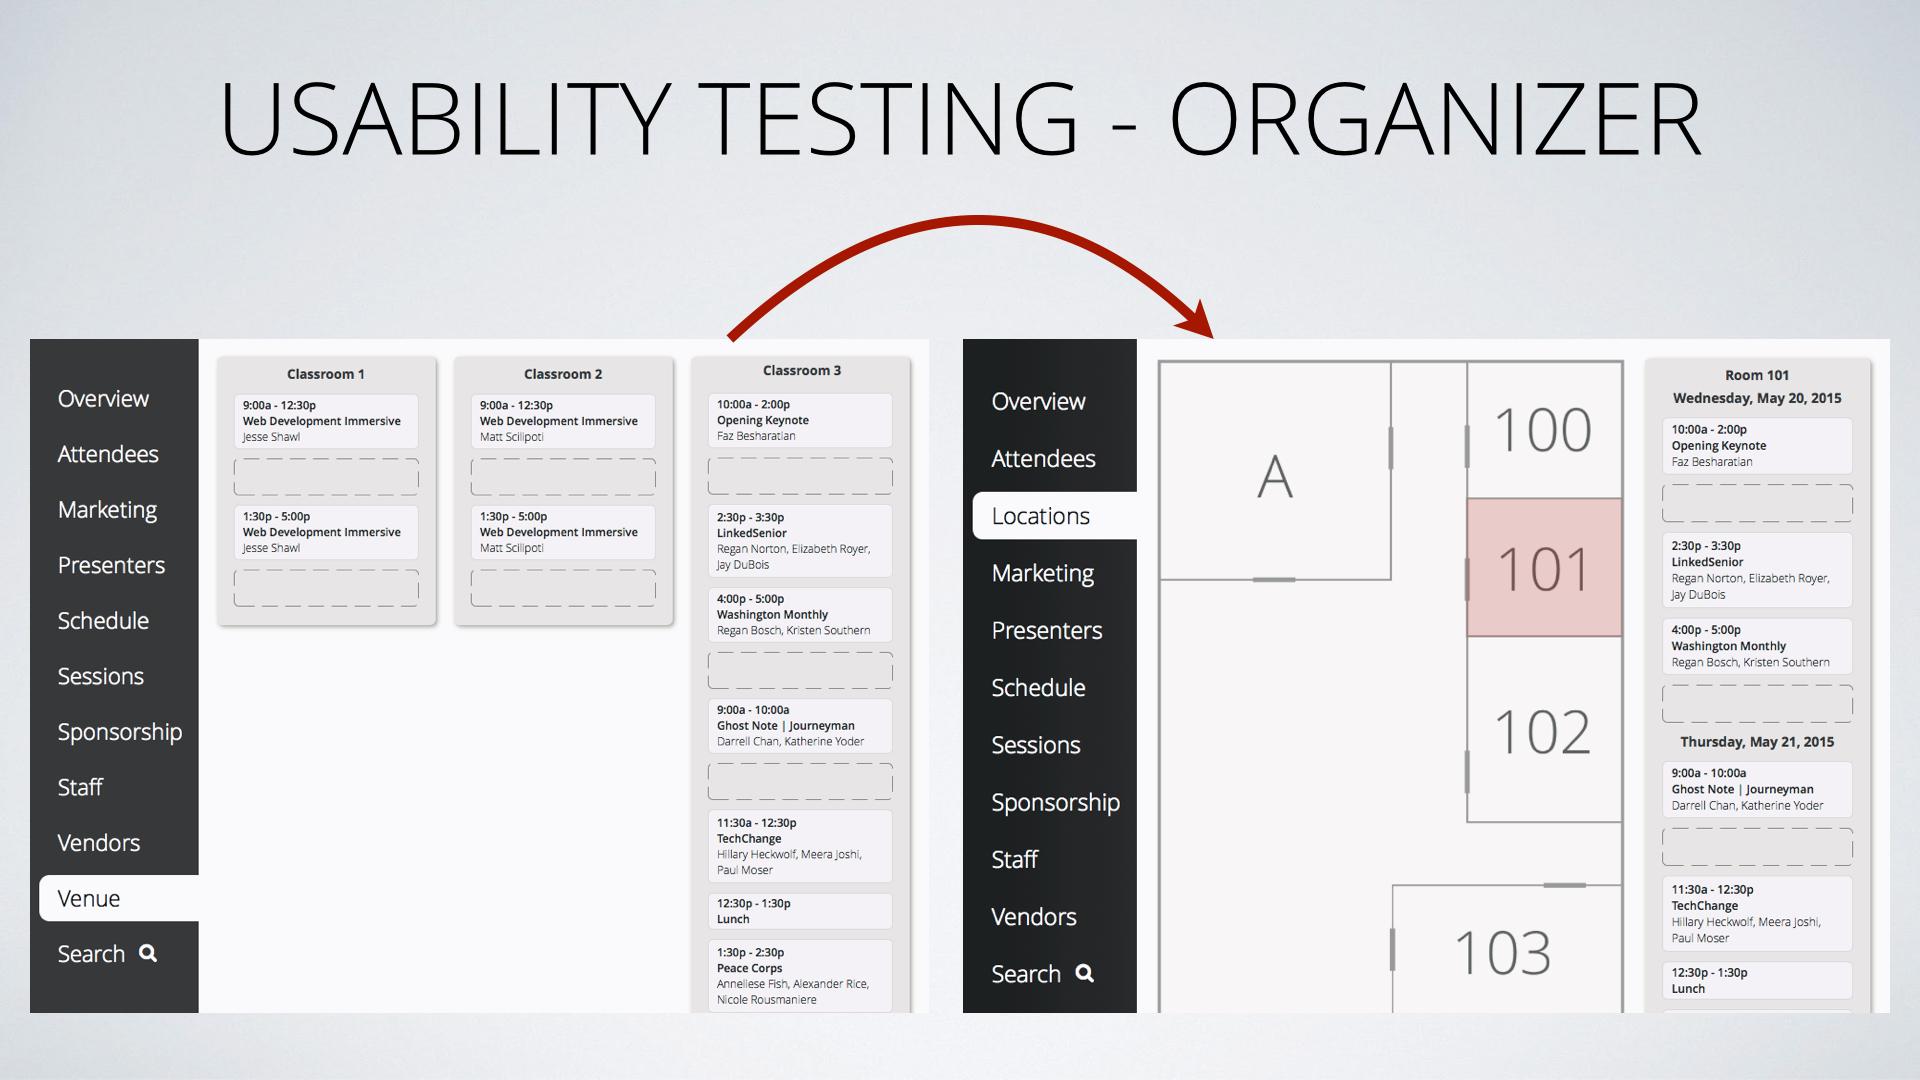 Usability Testing - Organizer